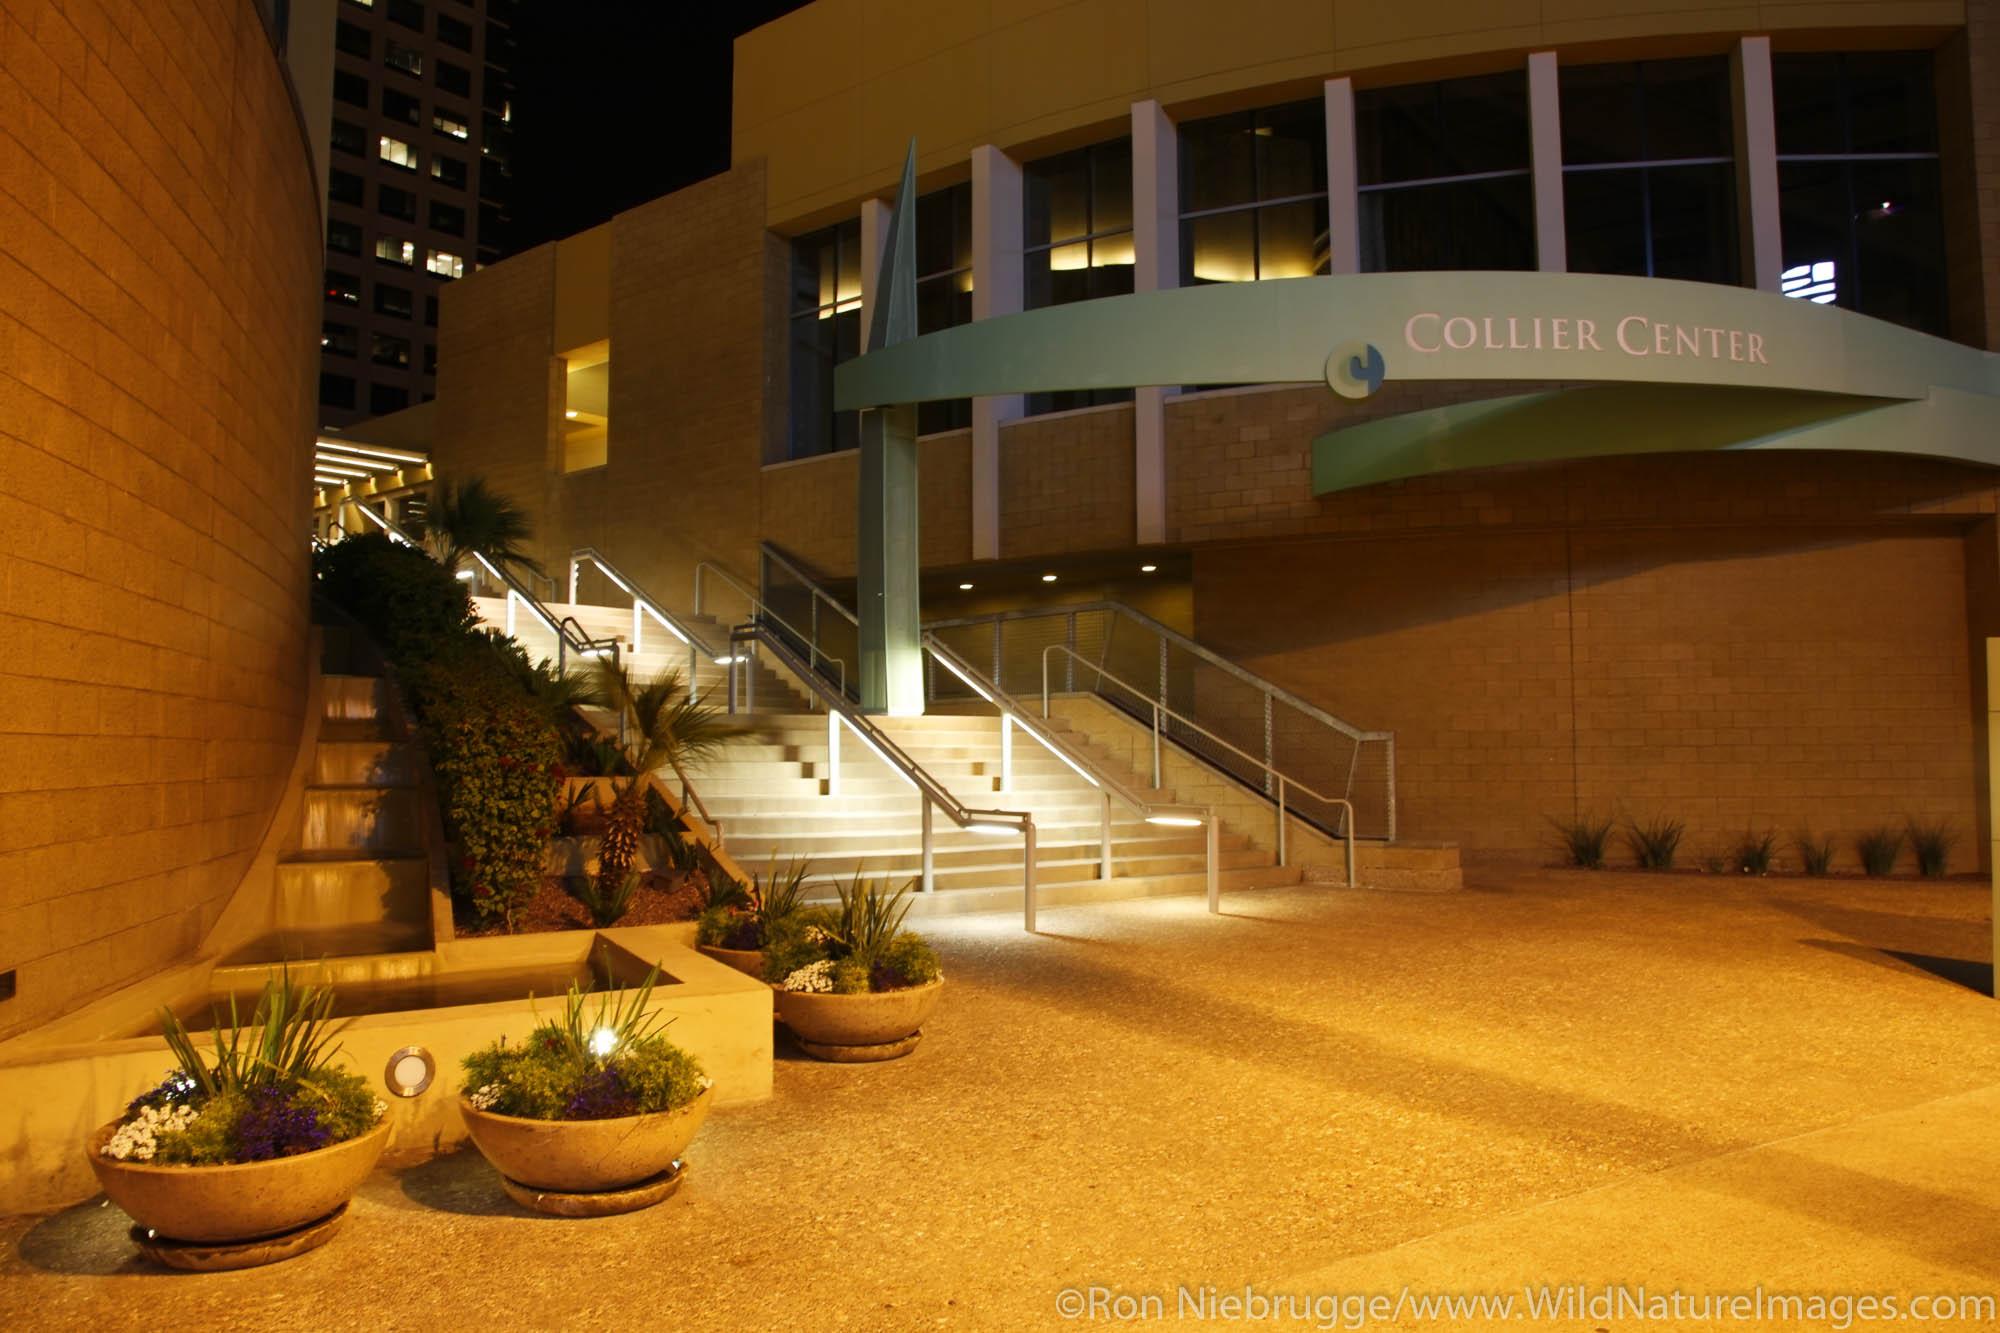 Collier Center, downtown Phoenix, Arizona.